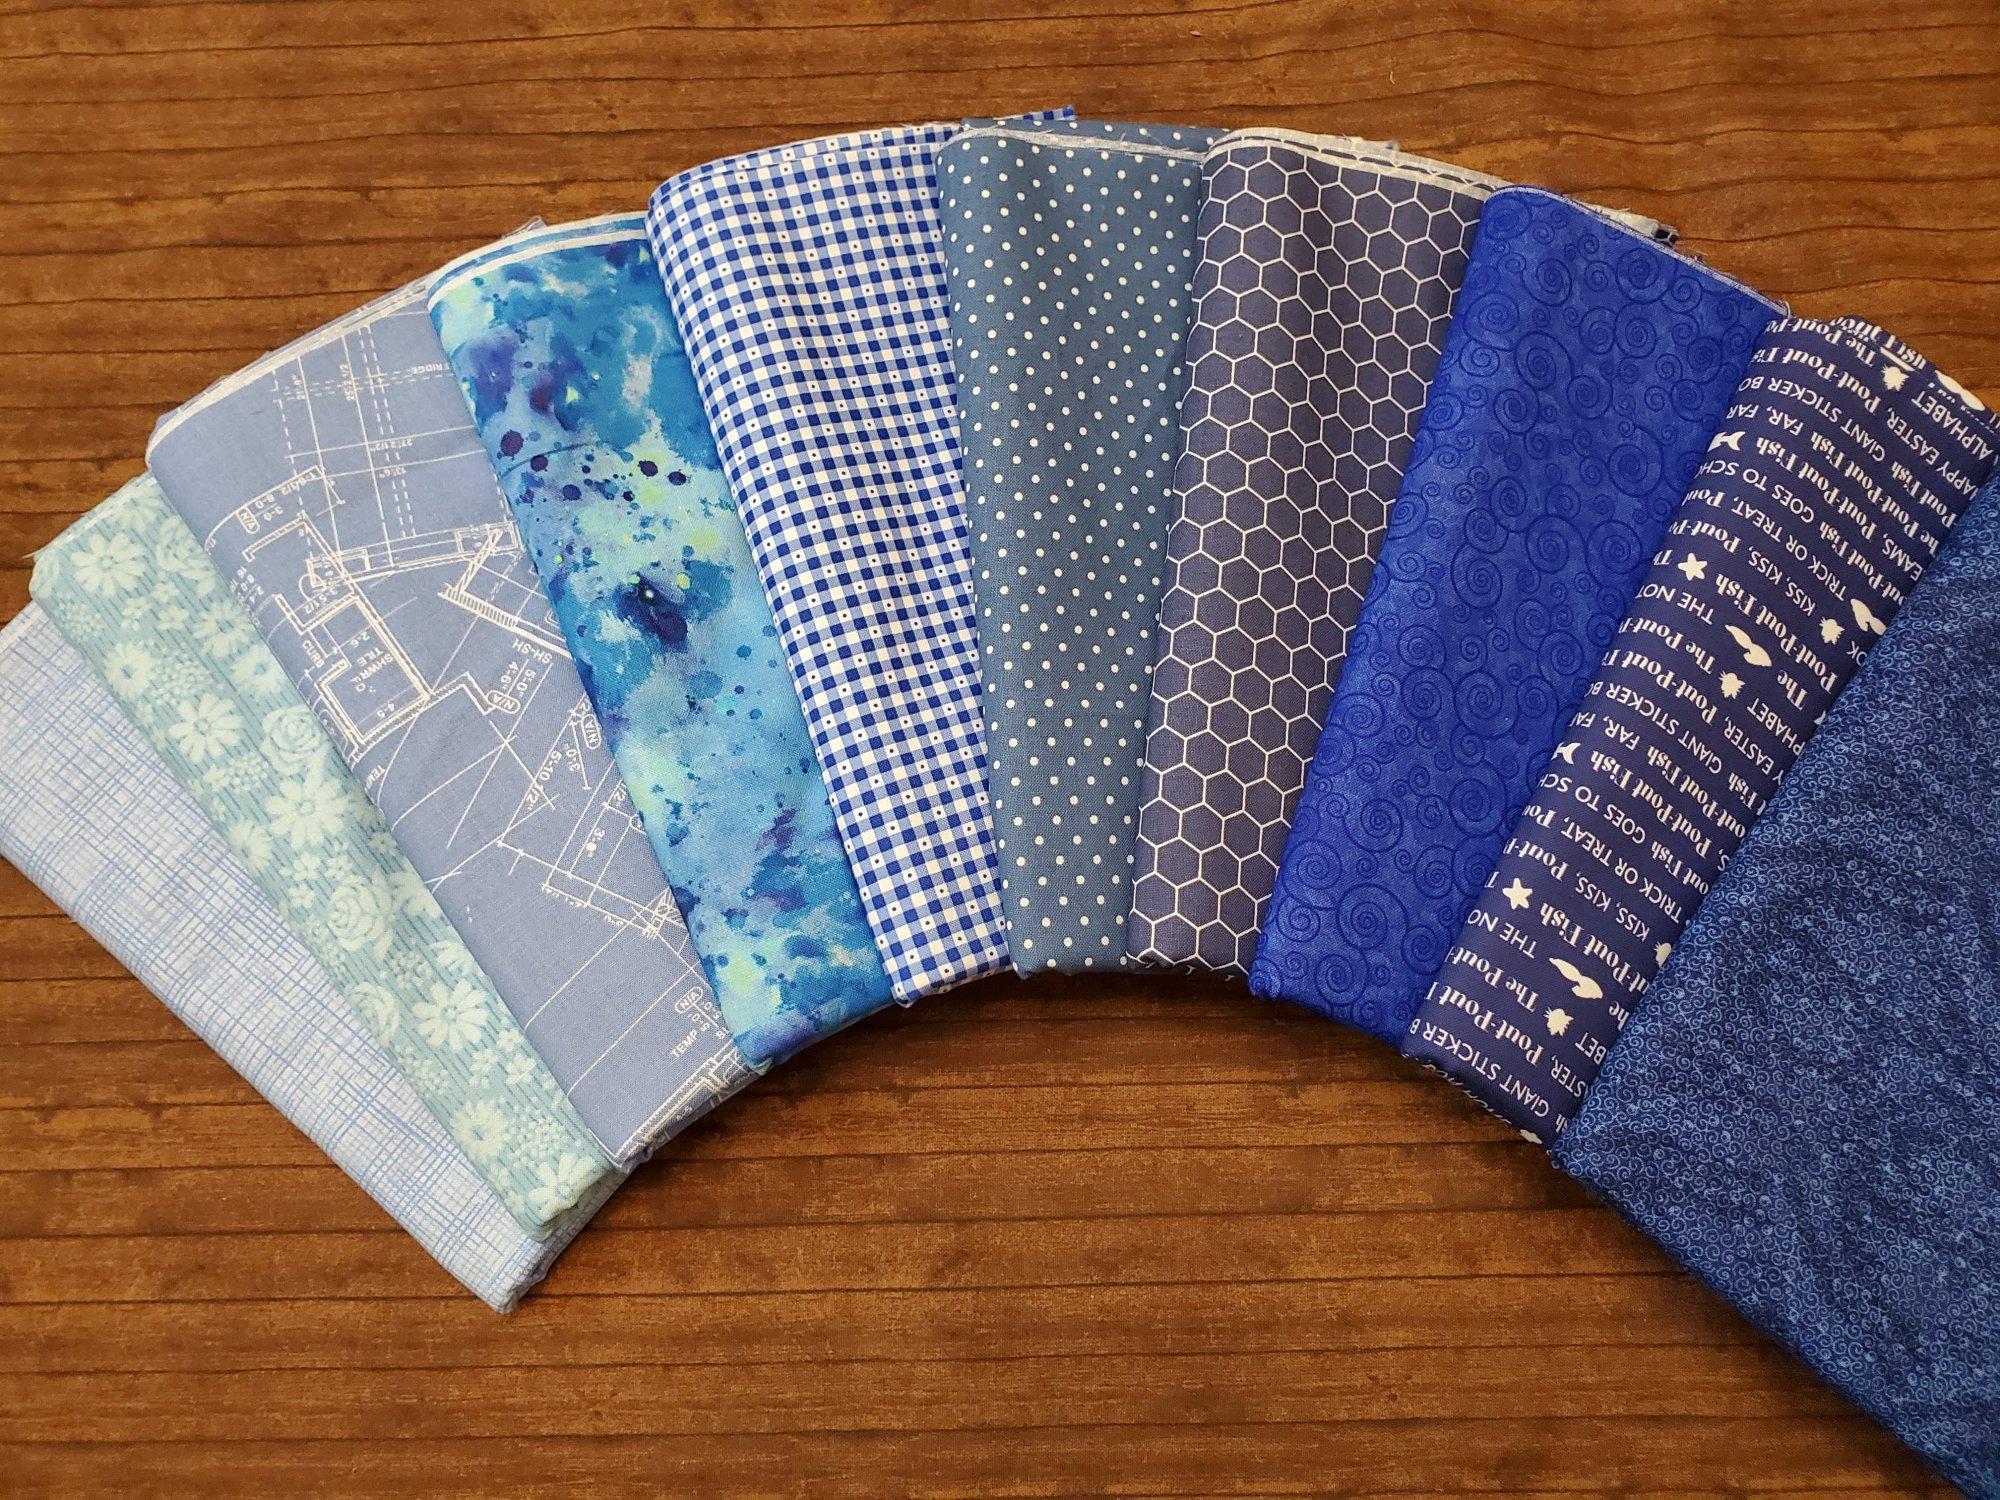 FULL YARD: Mixture of BLUES - 10 Piece FULL Yard Bundle Pack - all LQS Fabrics